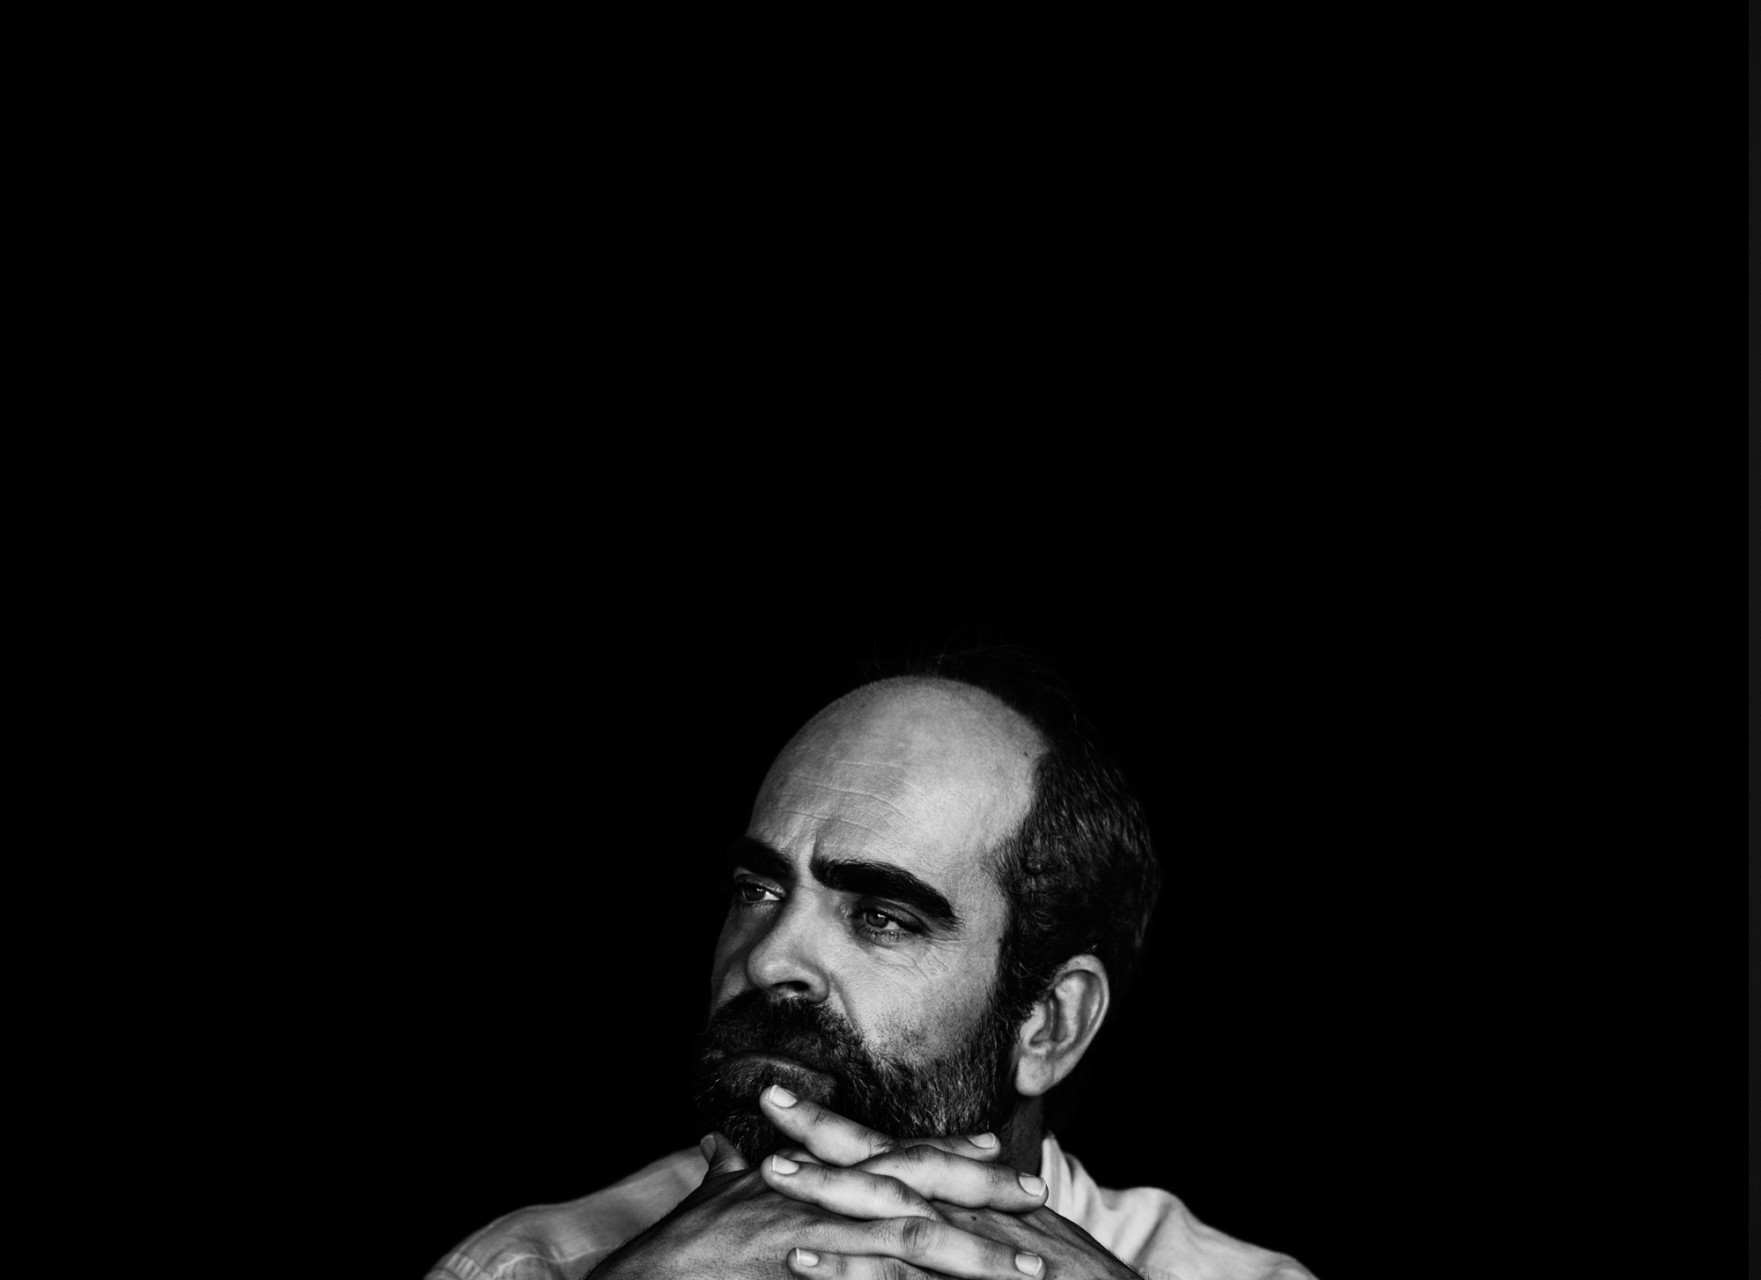 Luis Tosar / Actor